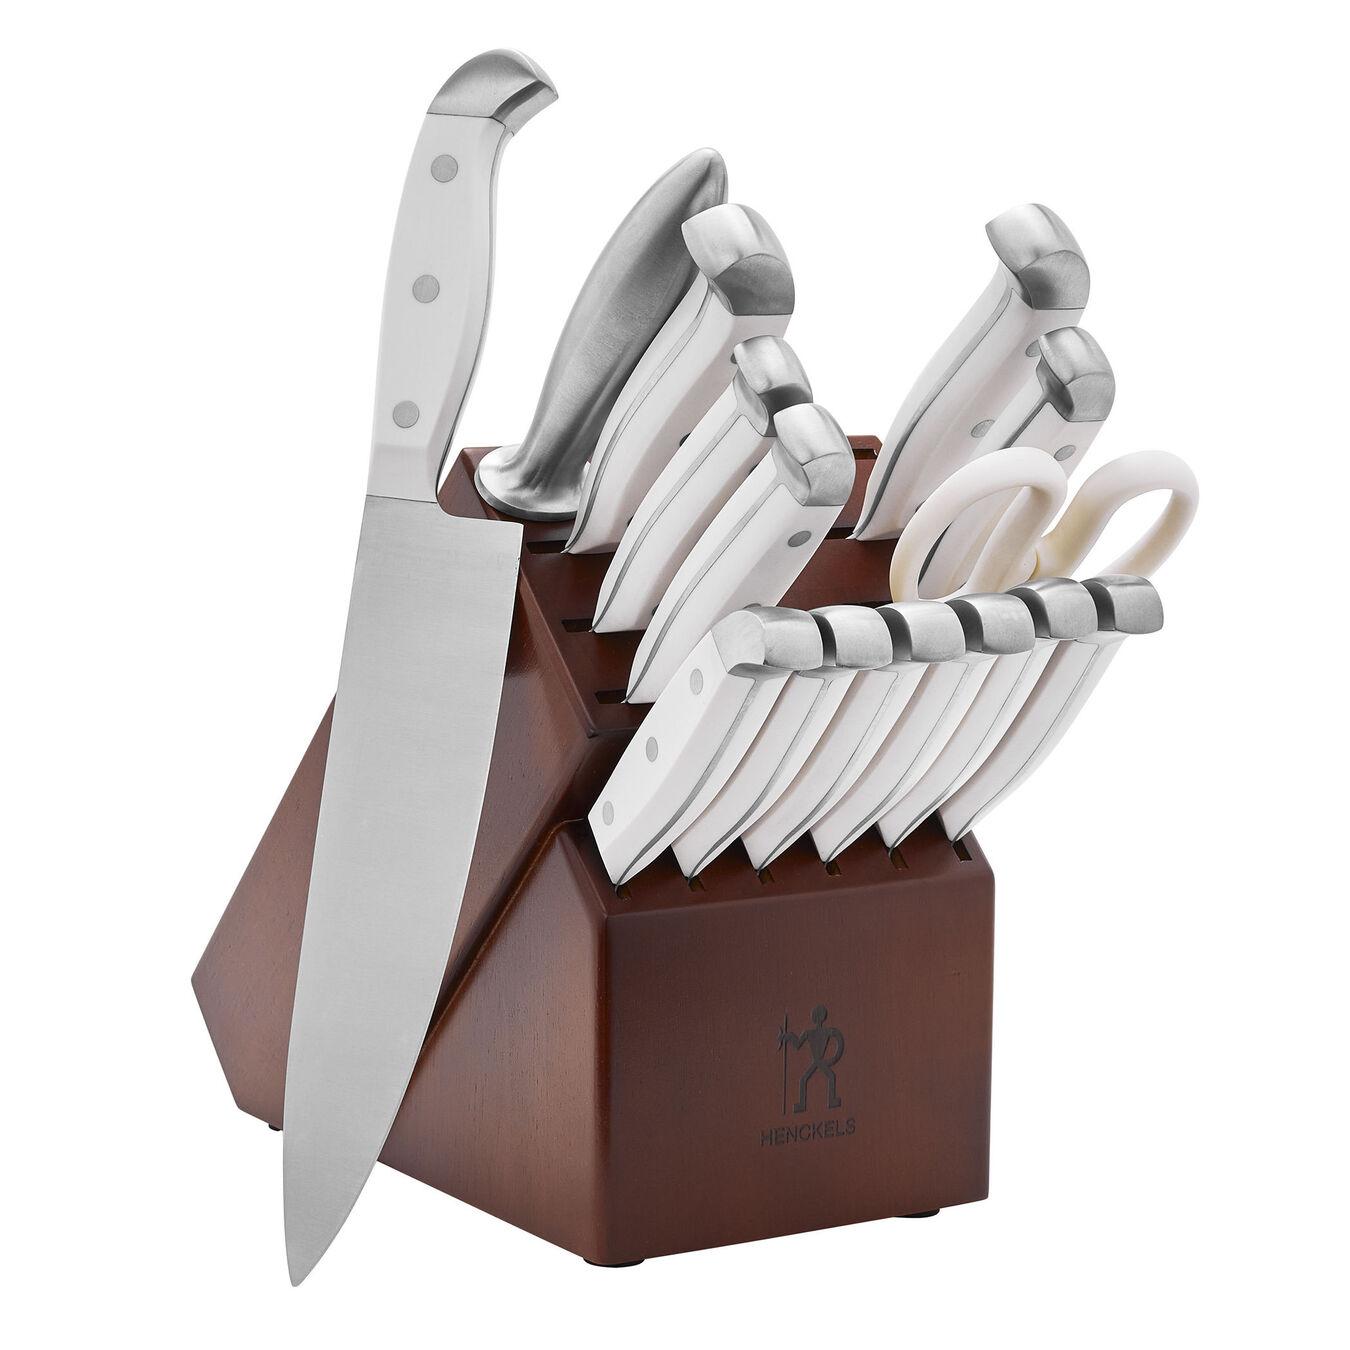 15-pc, Knife block set, white,,large 2